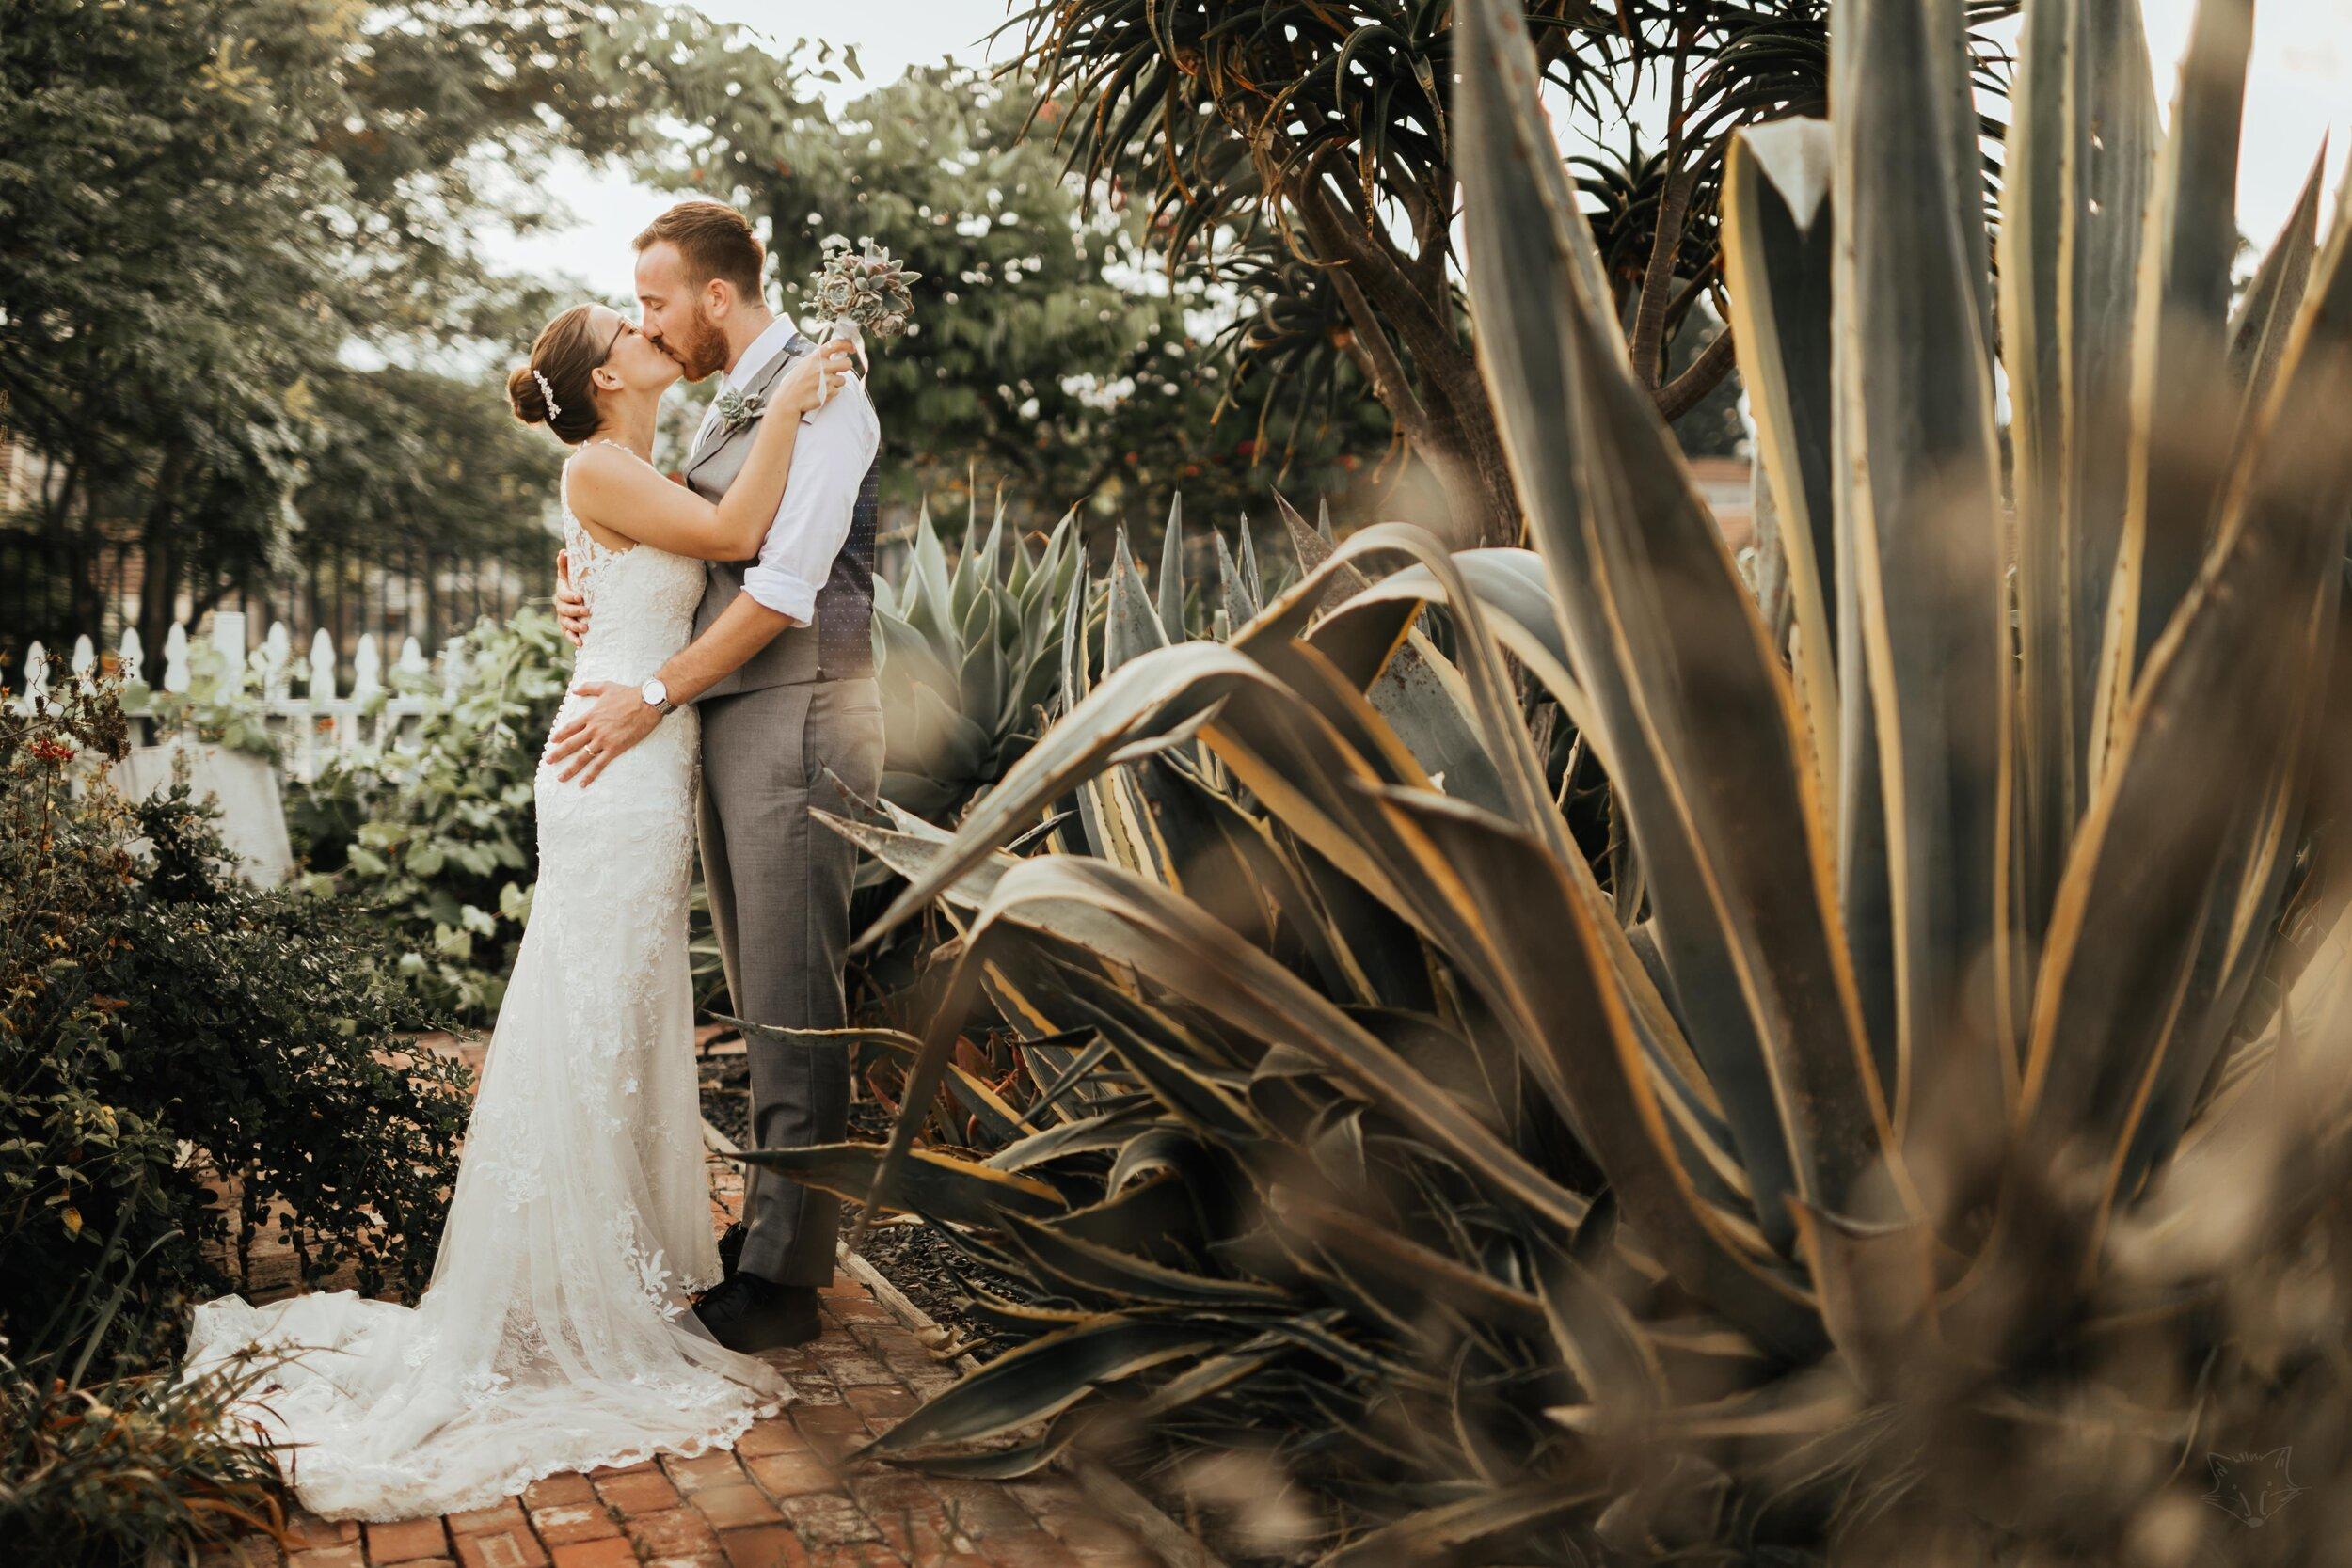 newland_barn_hungtington_beach__photoshoot_joshuachun_wedding-1316.jpg